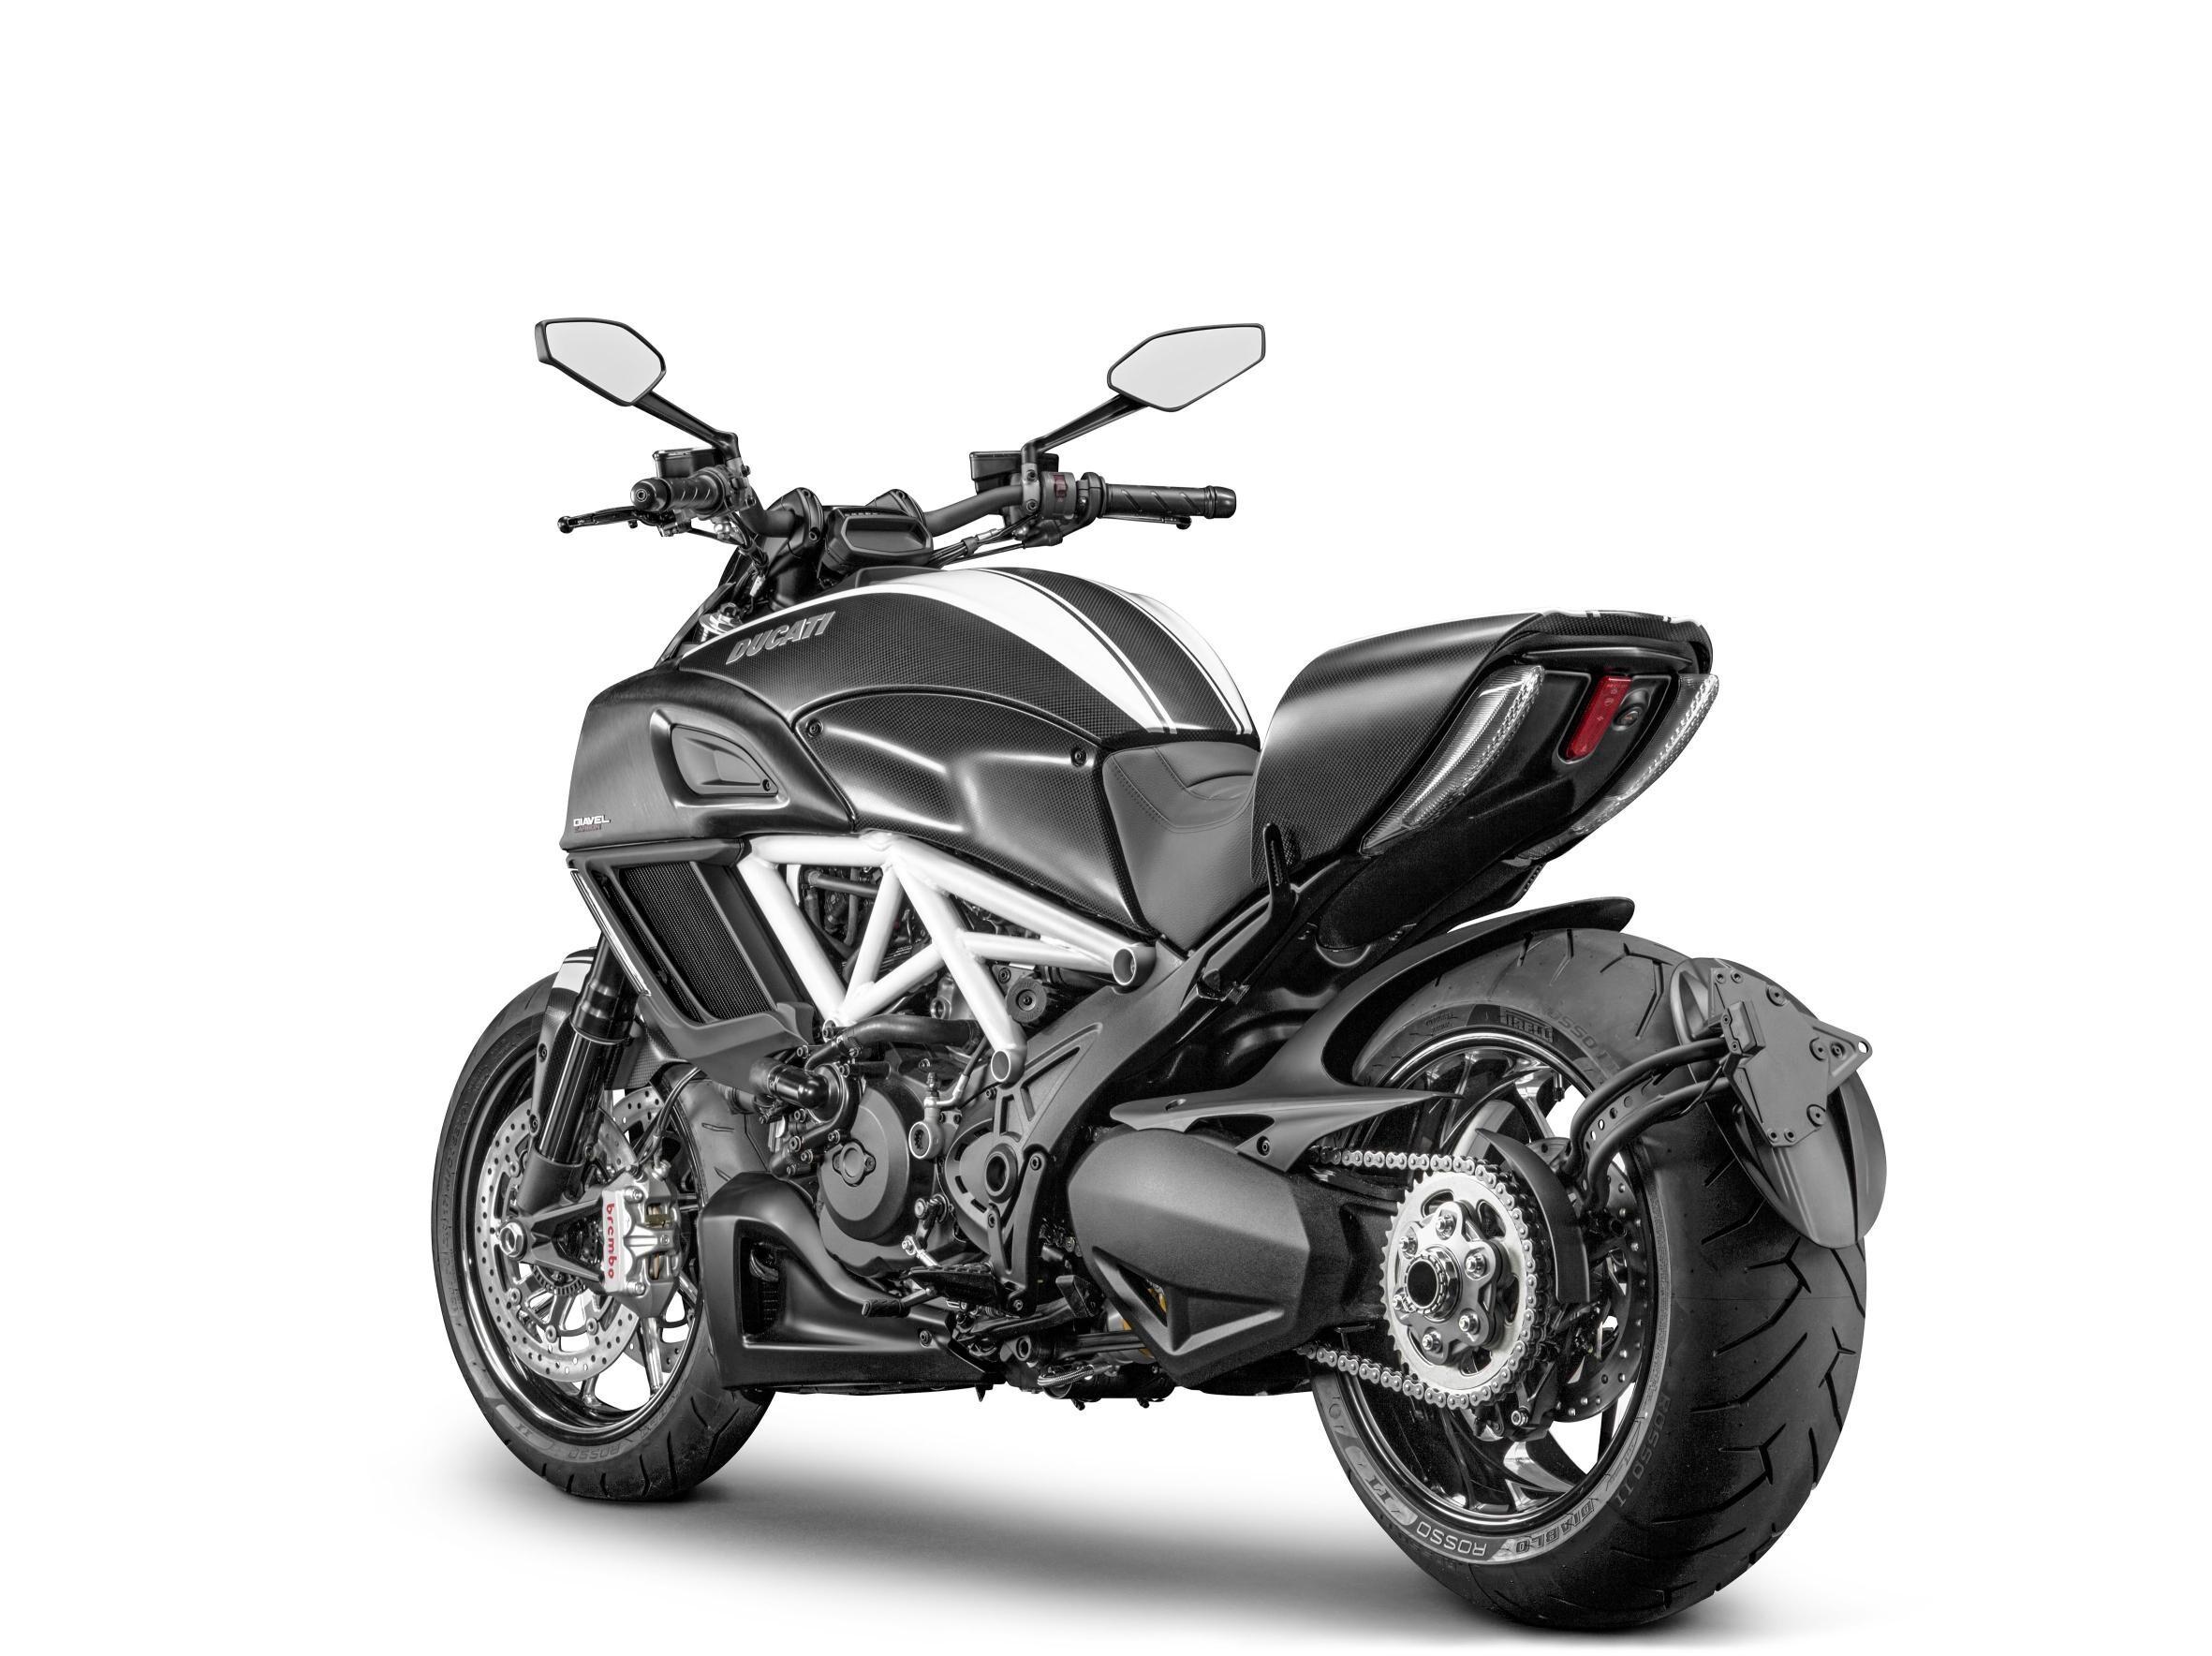 New Bike Hd >> Ducati New Black Bike Hd Wallpapers Hd Wallpapers